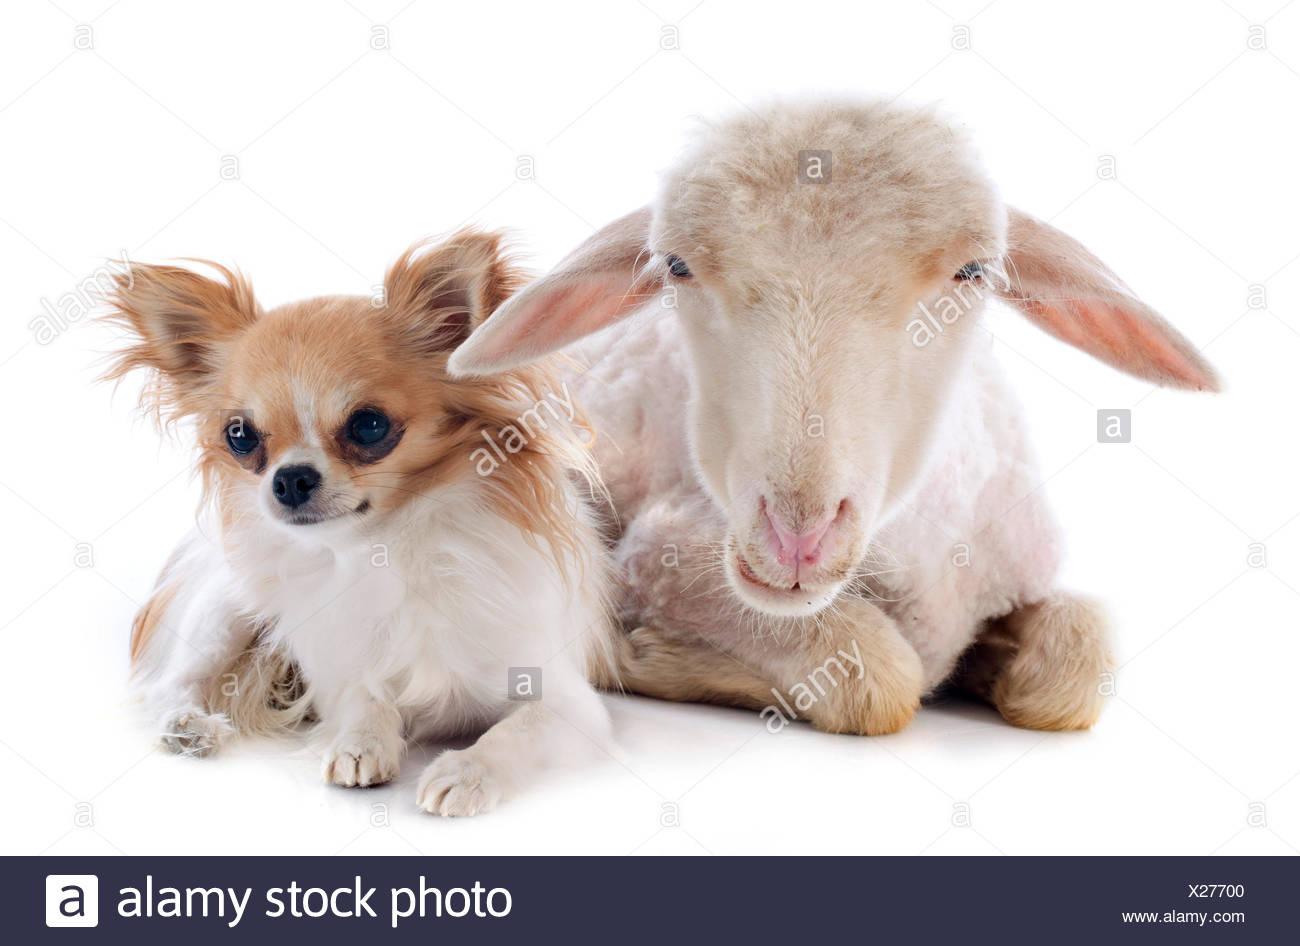 sheep, dog, three, cat baby, kitten, ewe, pussycat, cat, domestic cat, lamb, - Stock Image